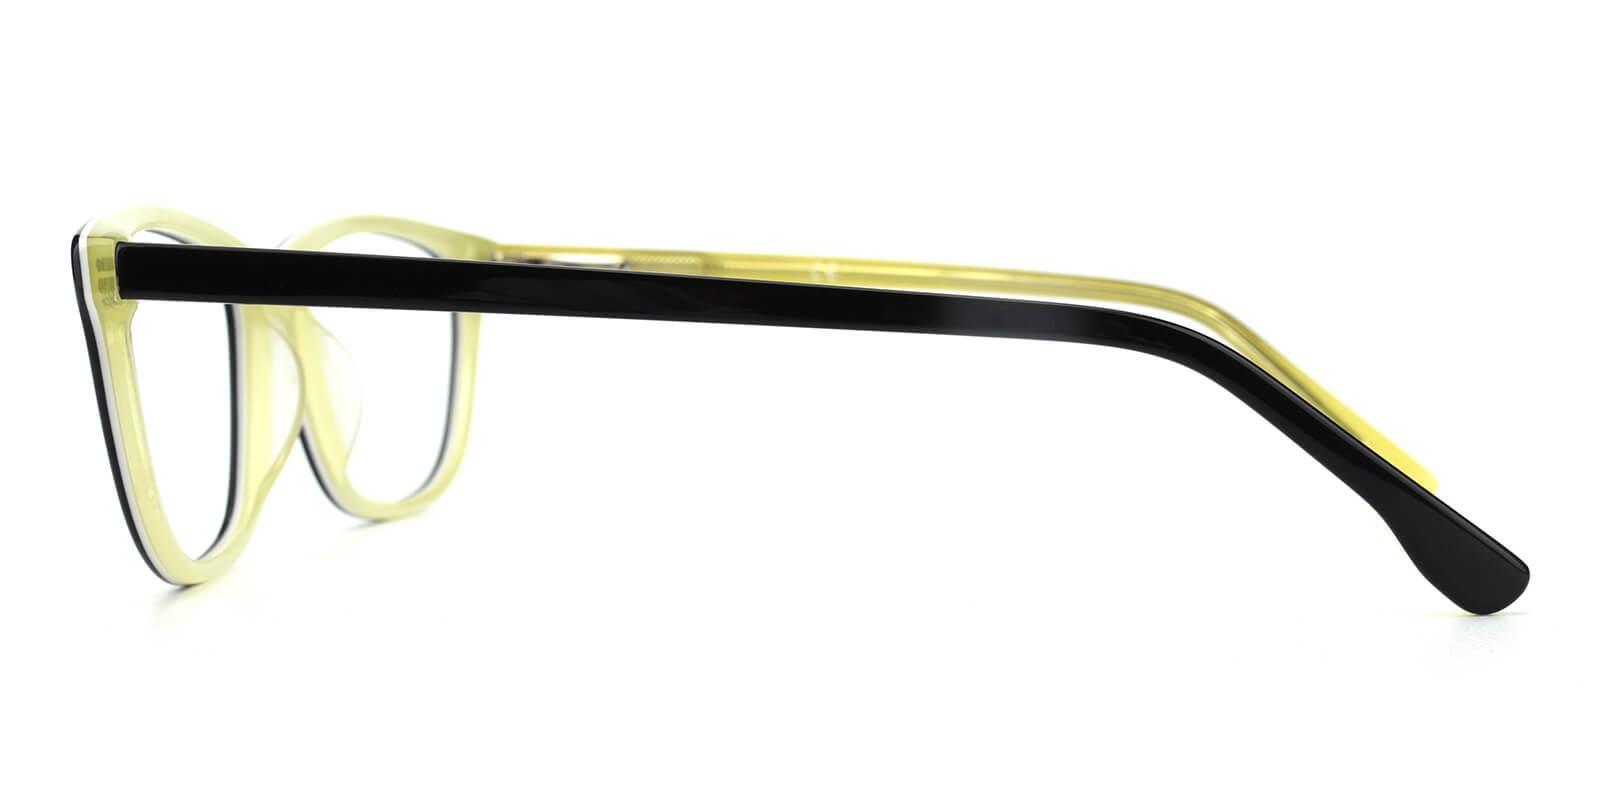 Emblem-Yellow-Square / Cat-Acetate-Eyeglasses-detail